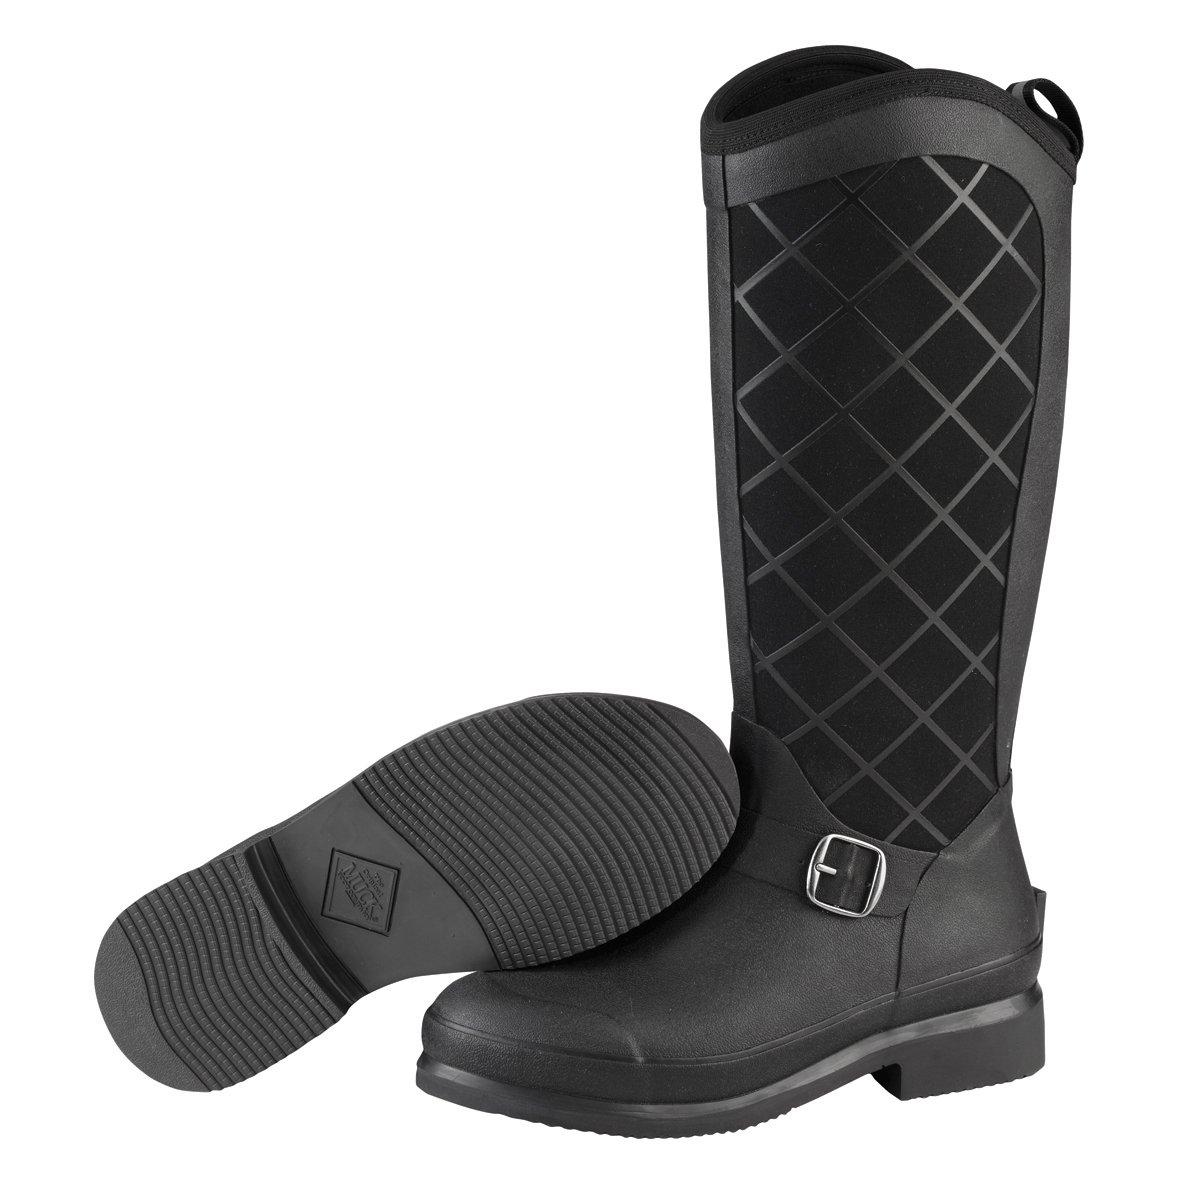 MuckBoots Women's Pacy II Snow Boot B00IHWA288 9 B(M) US|Chocolate